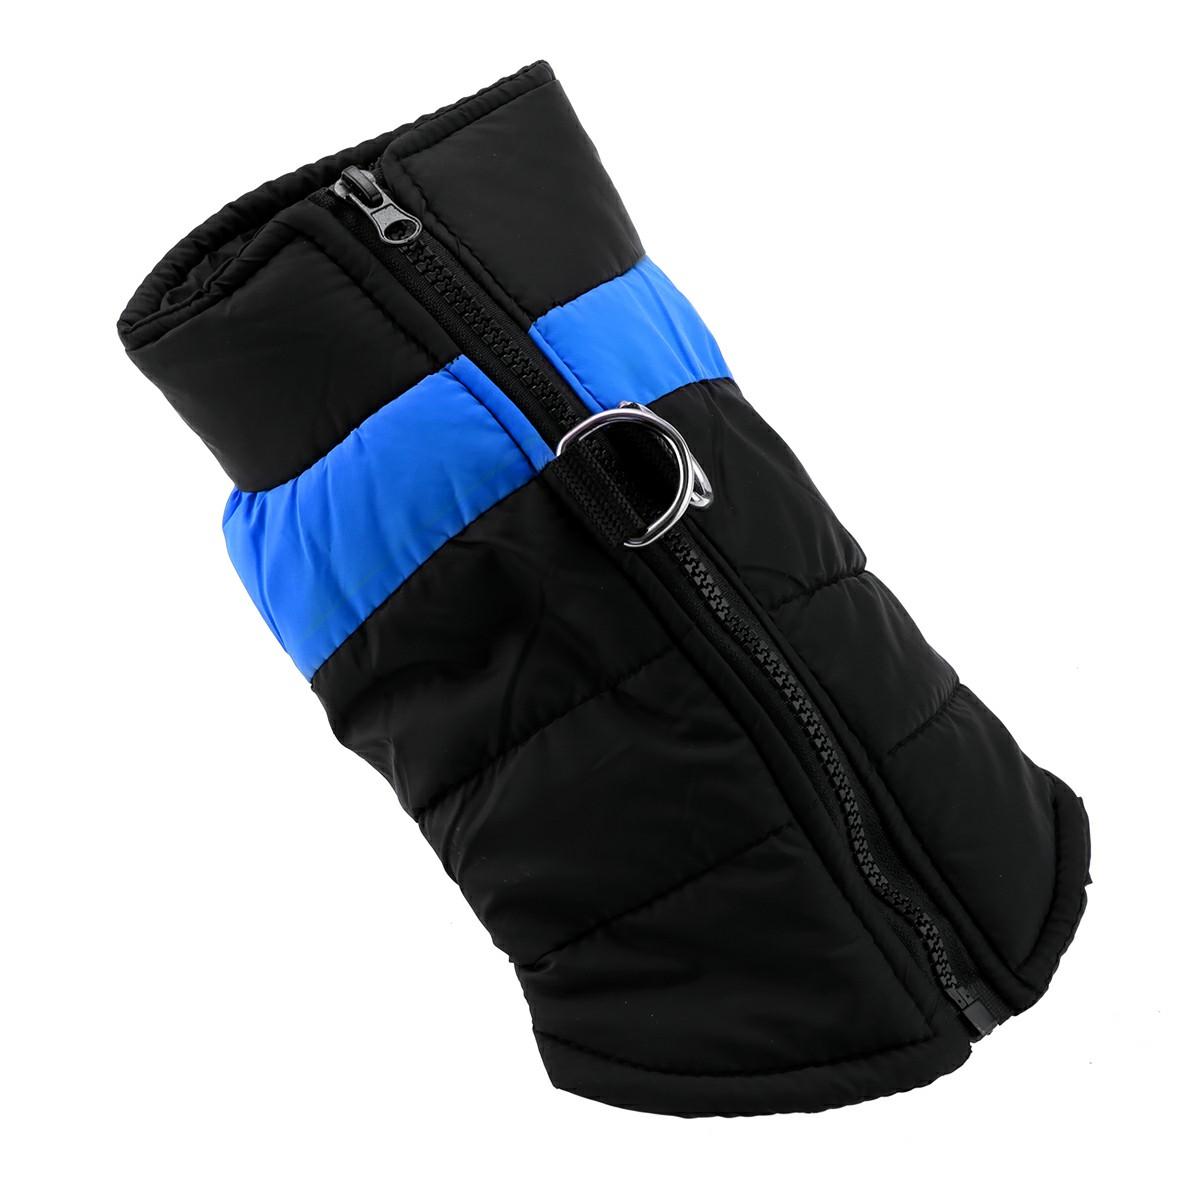 Comfy Soft Dog Vest Jacket Winter Waterproof Padded Pet Clothes Warm Vest Coat Size L - Blue